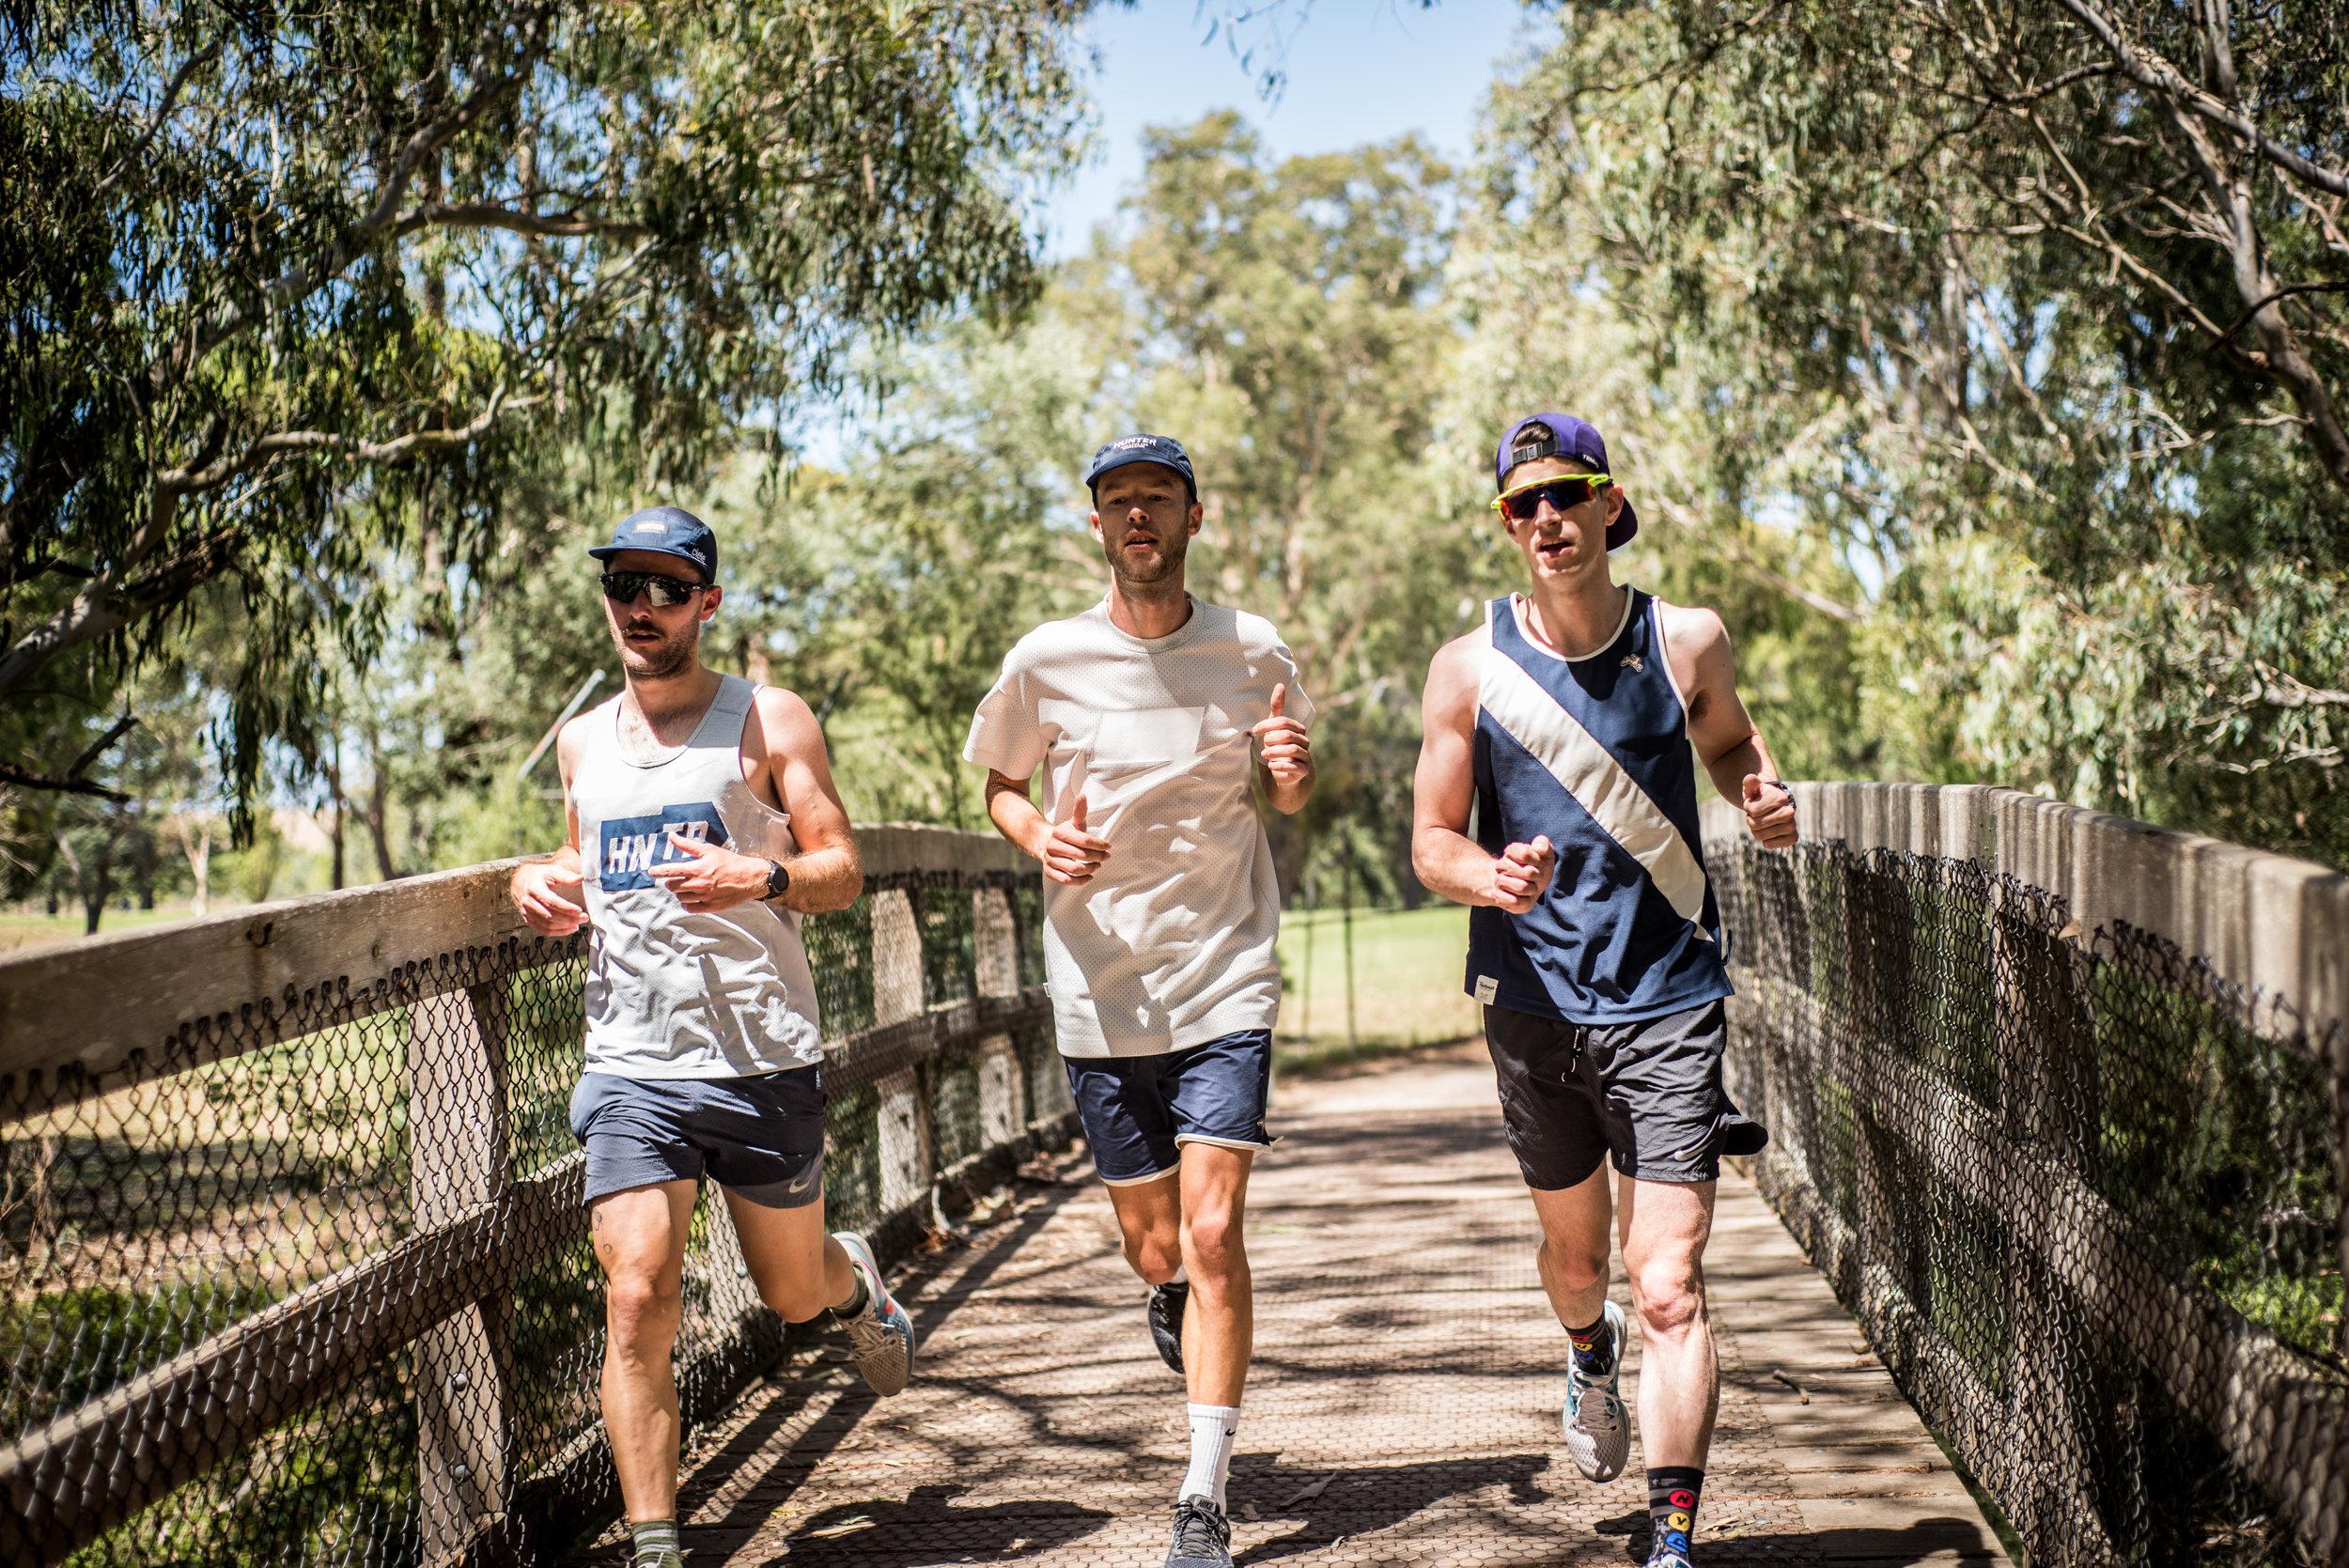 Gum trees - Very Australian